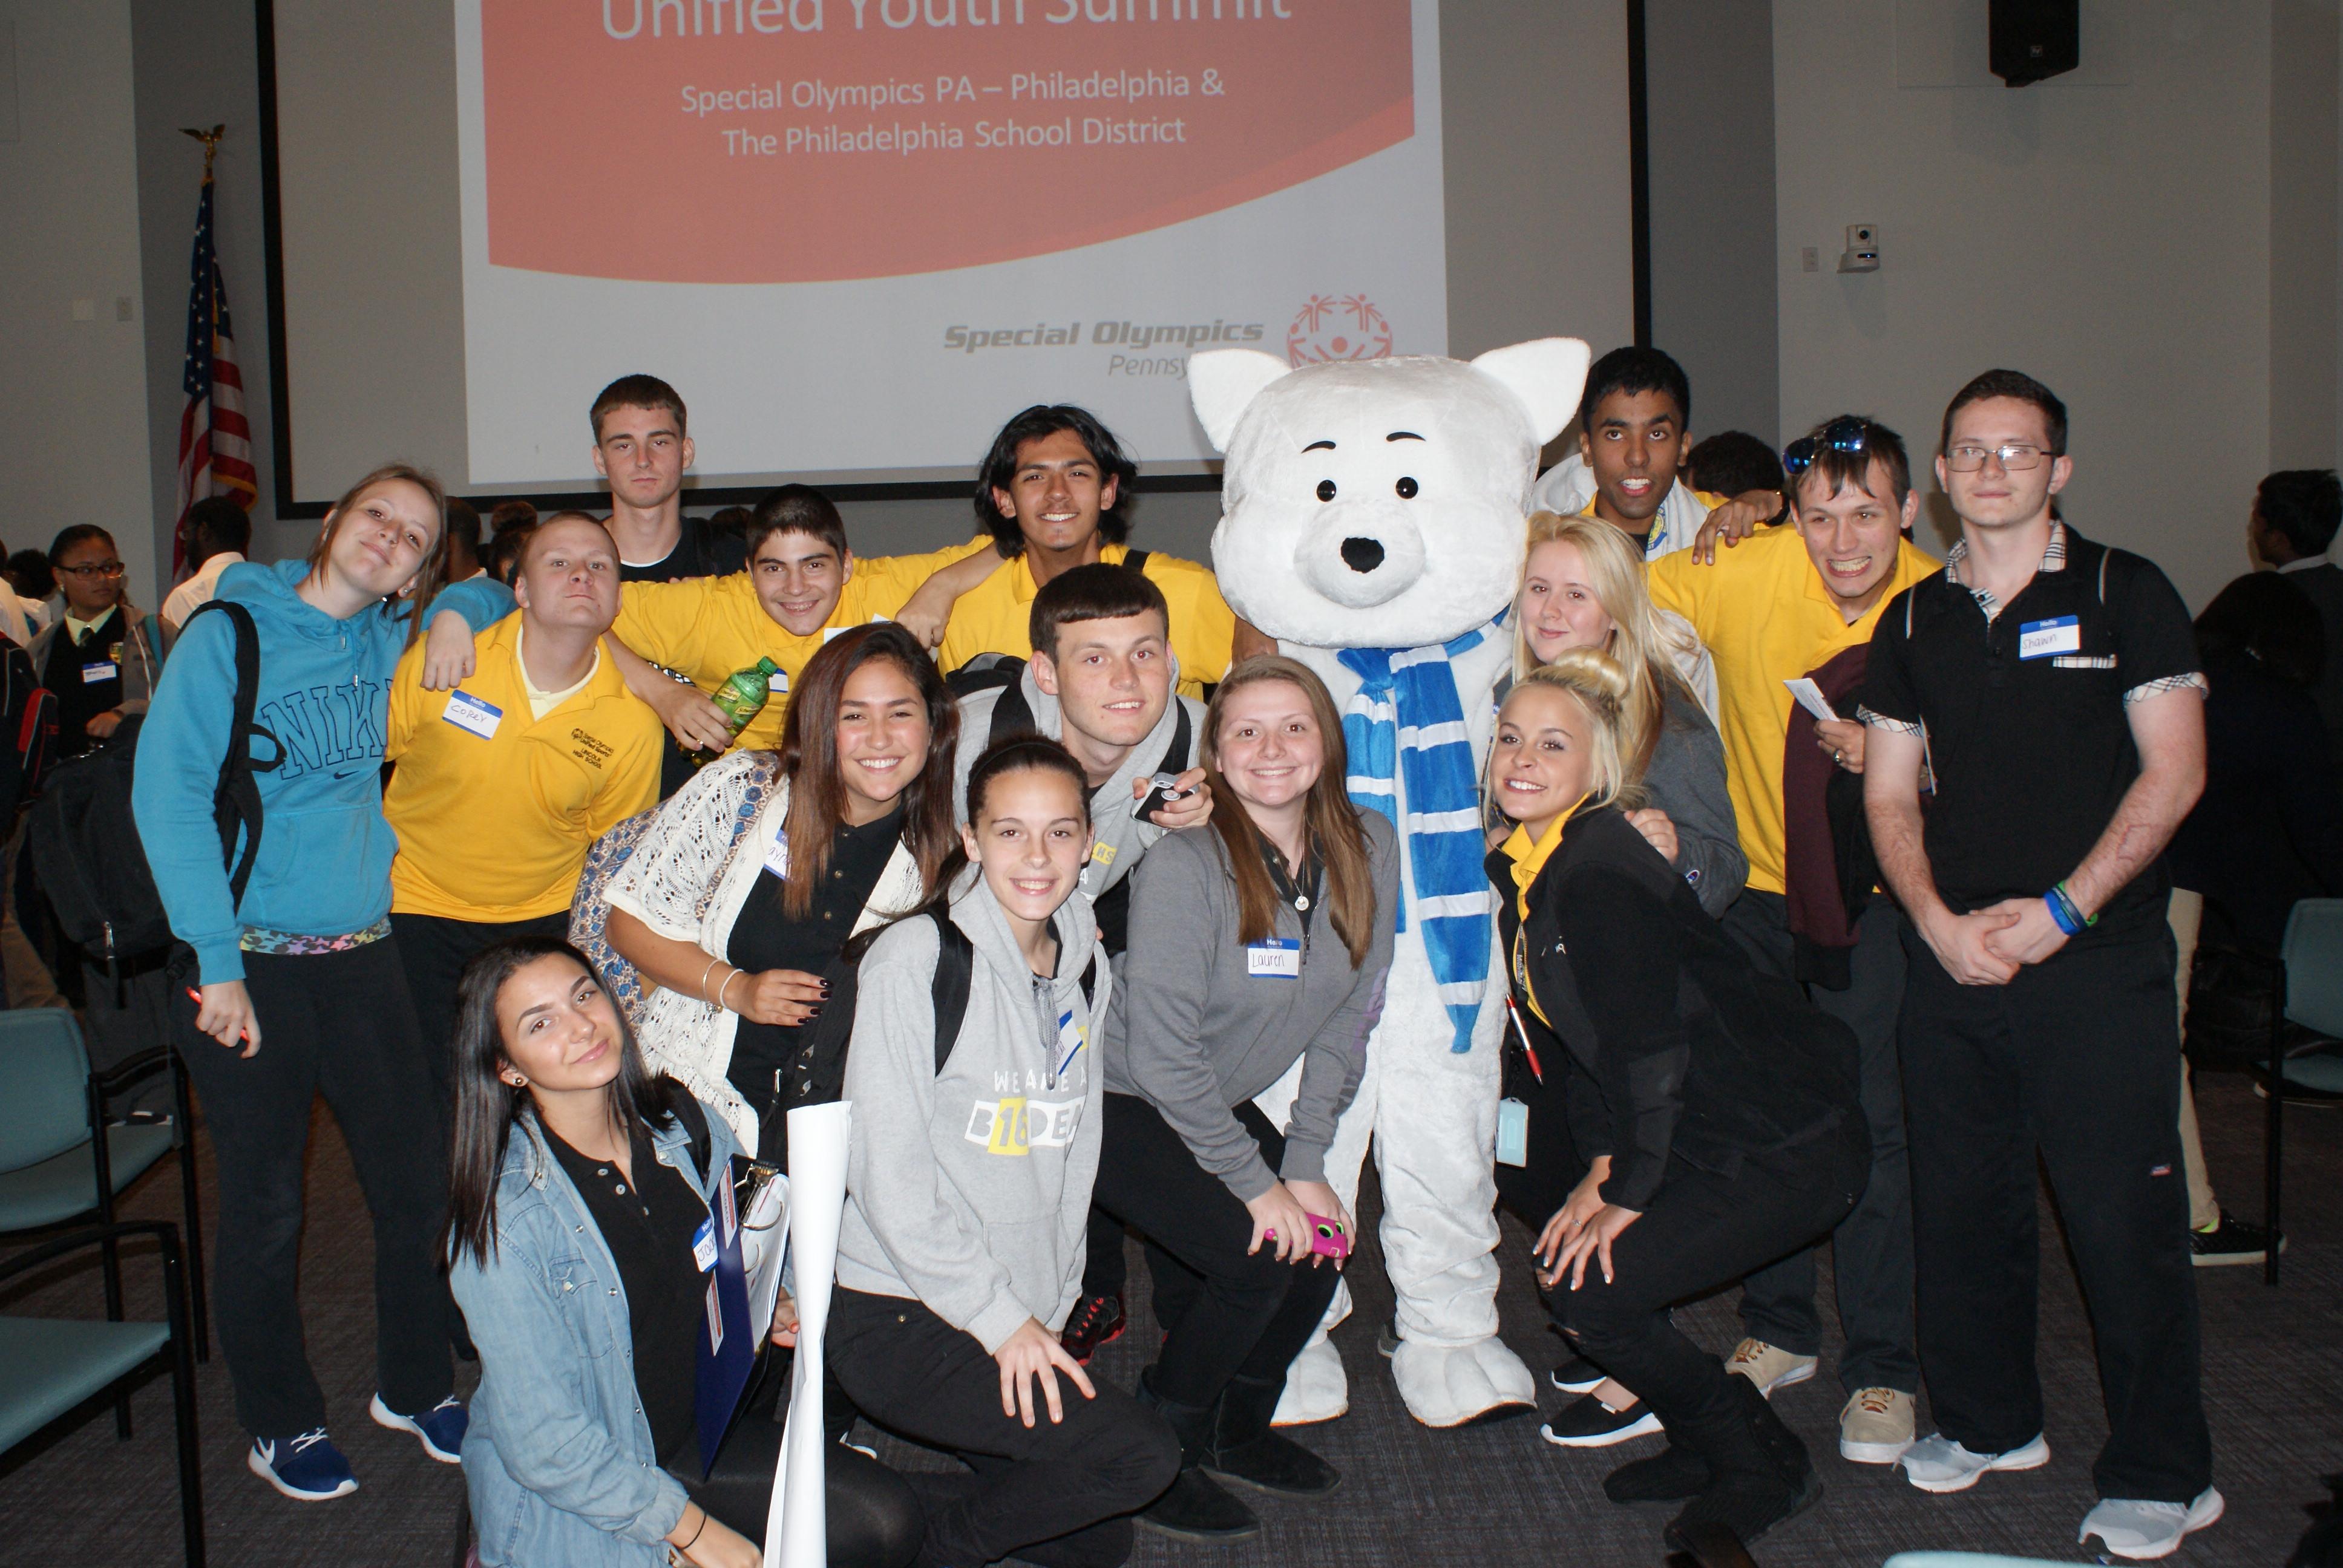 Gallery Special Olympics Pennsylvania Philadelphia